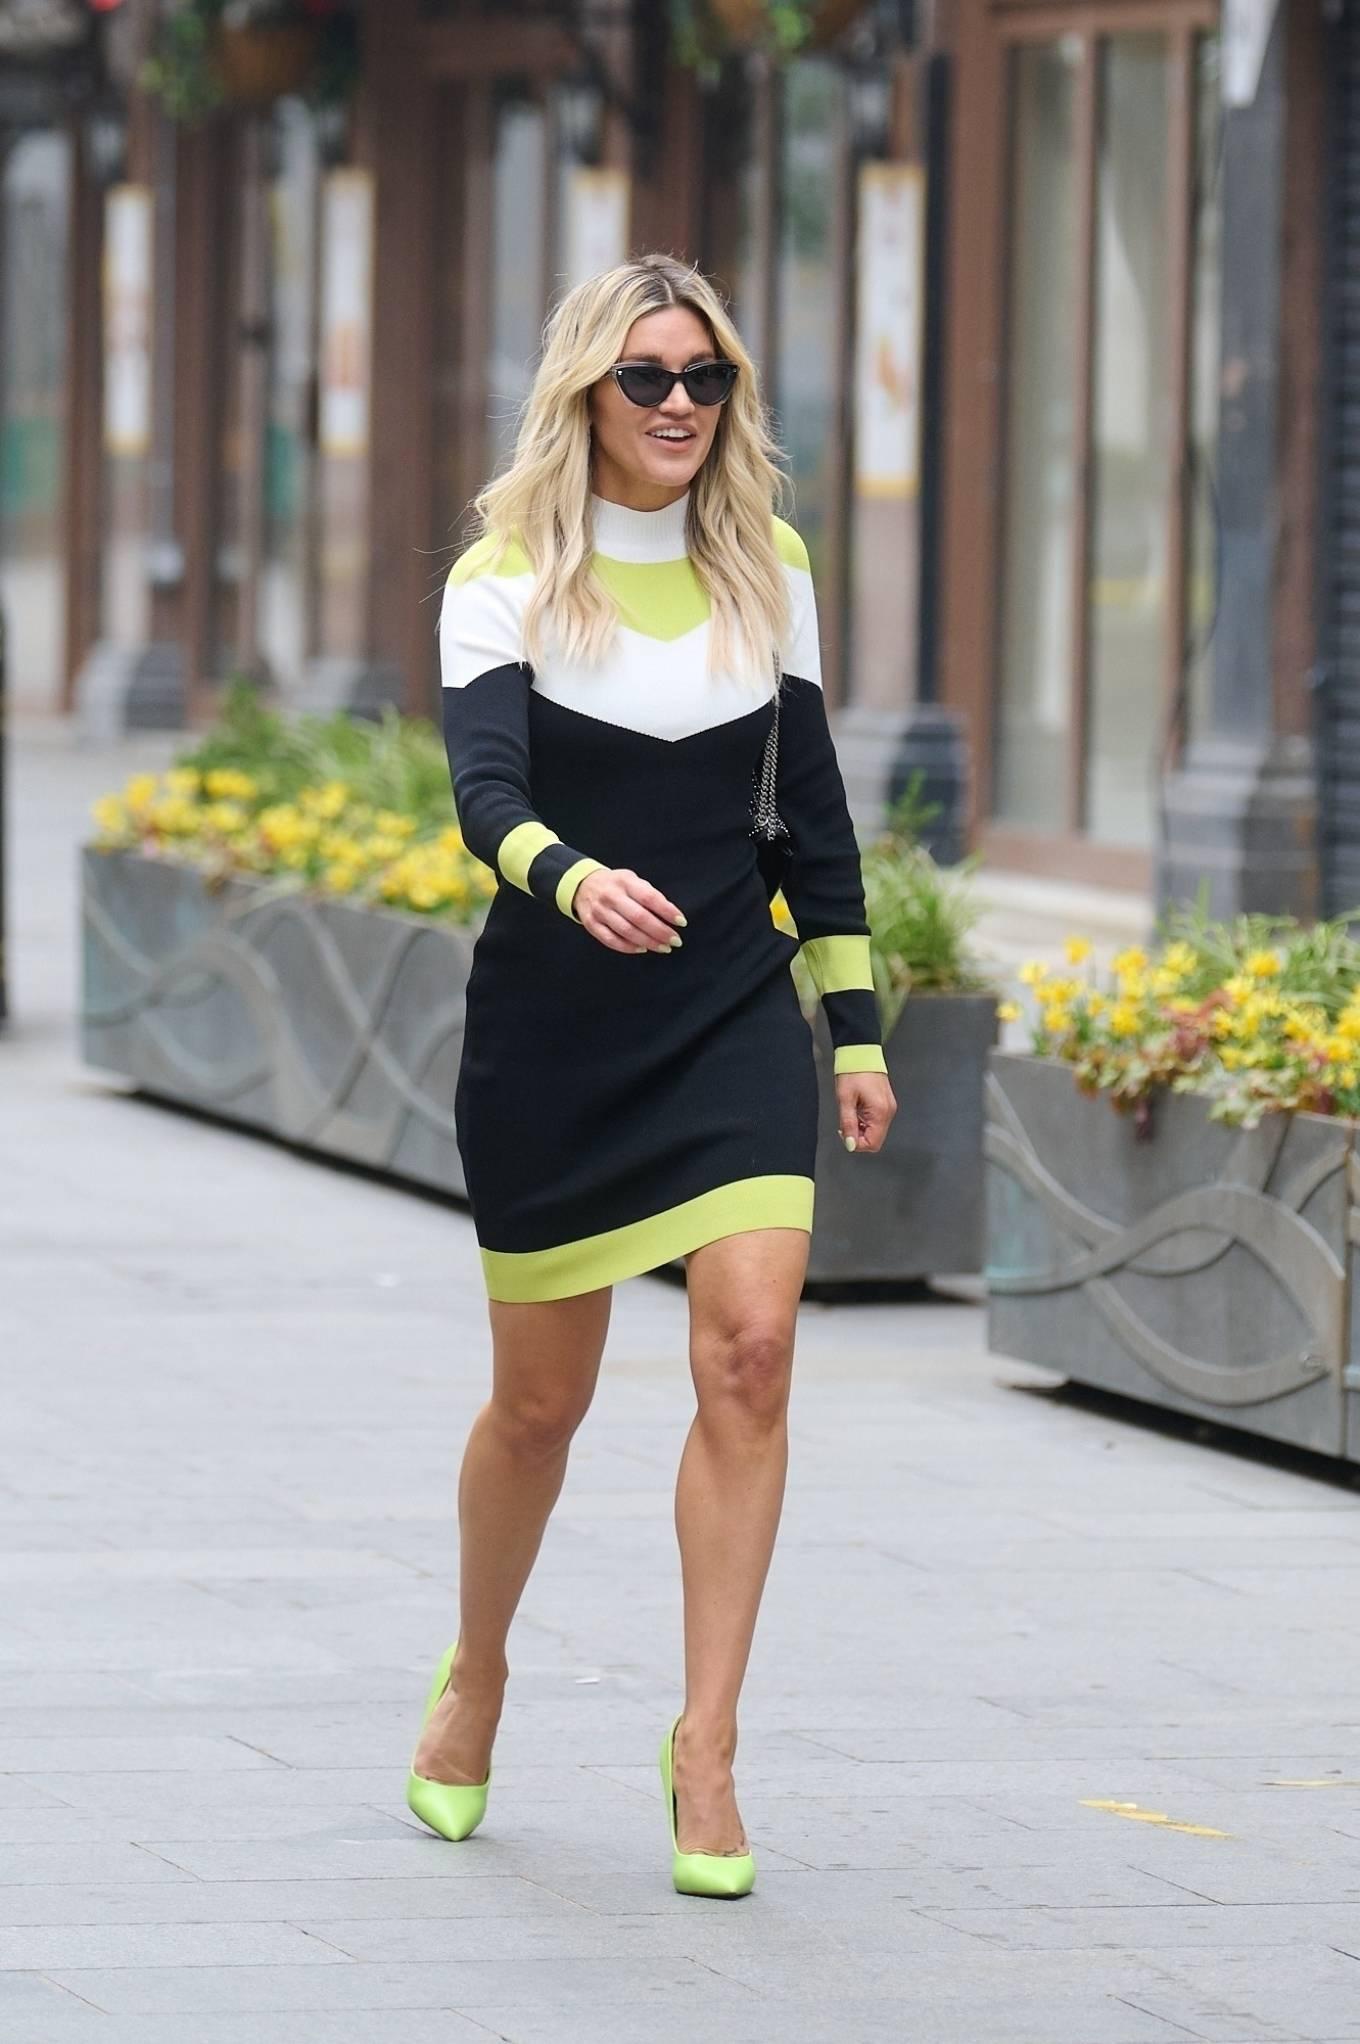 Ashley Roberts - Wears an outfit by Karen Millen in London